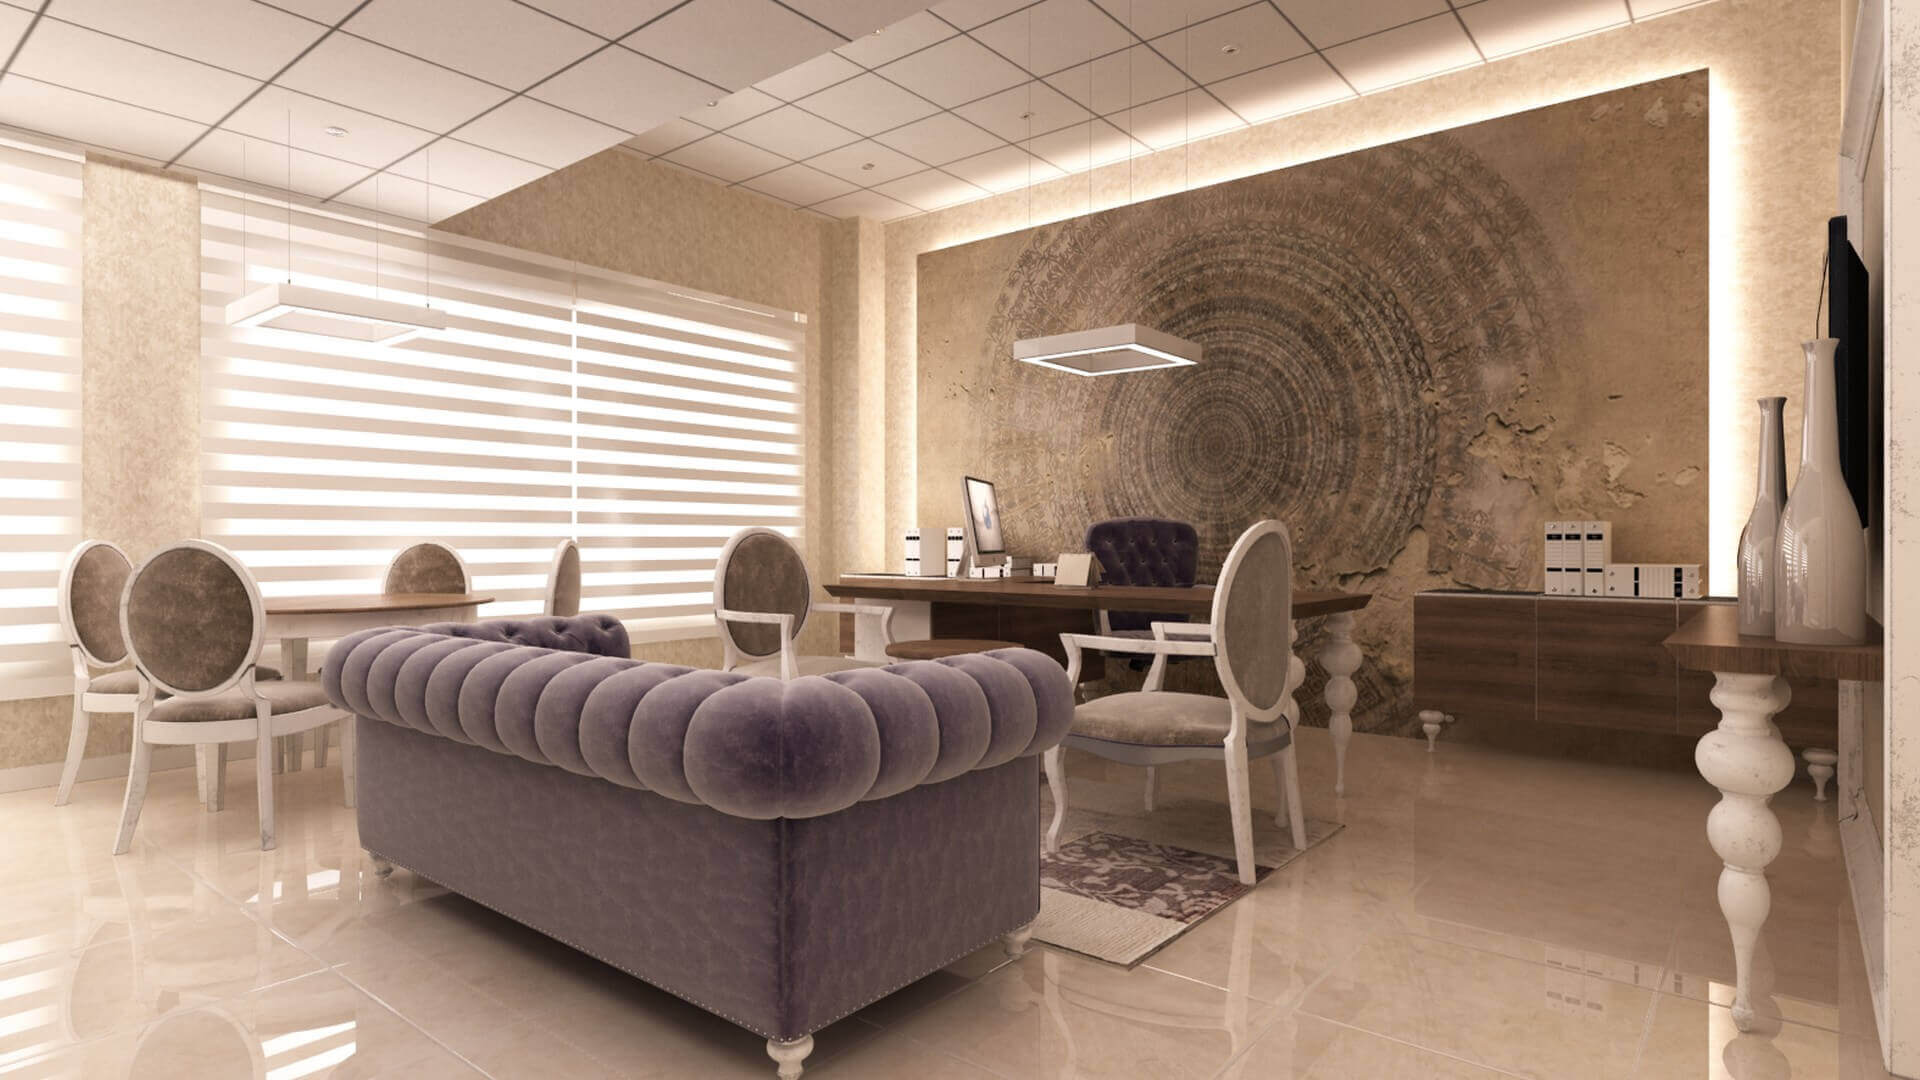 Akyurt 2729 Turk Ilac Office Building Offices